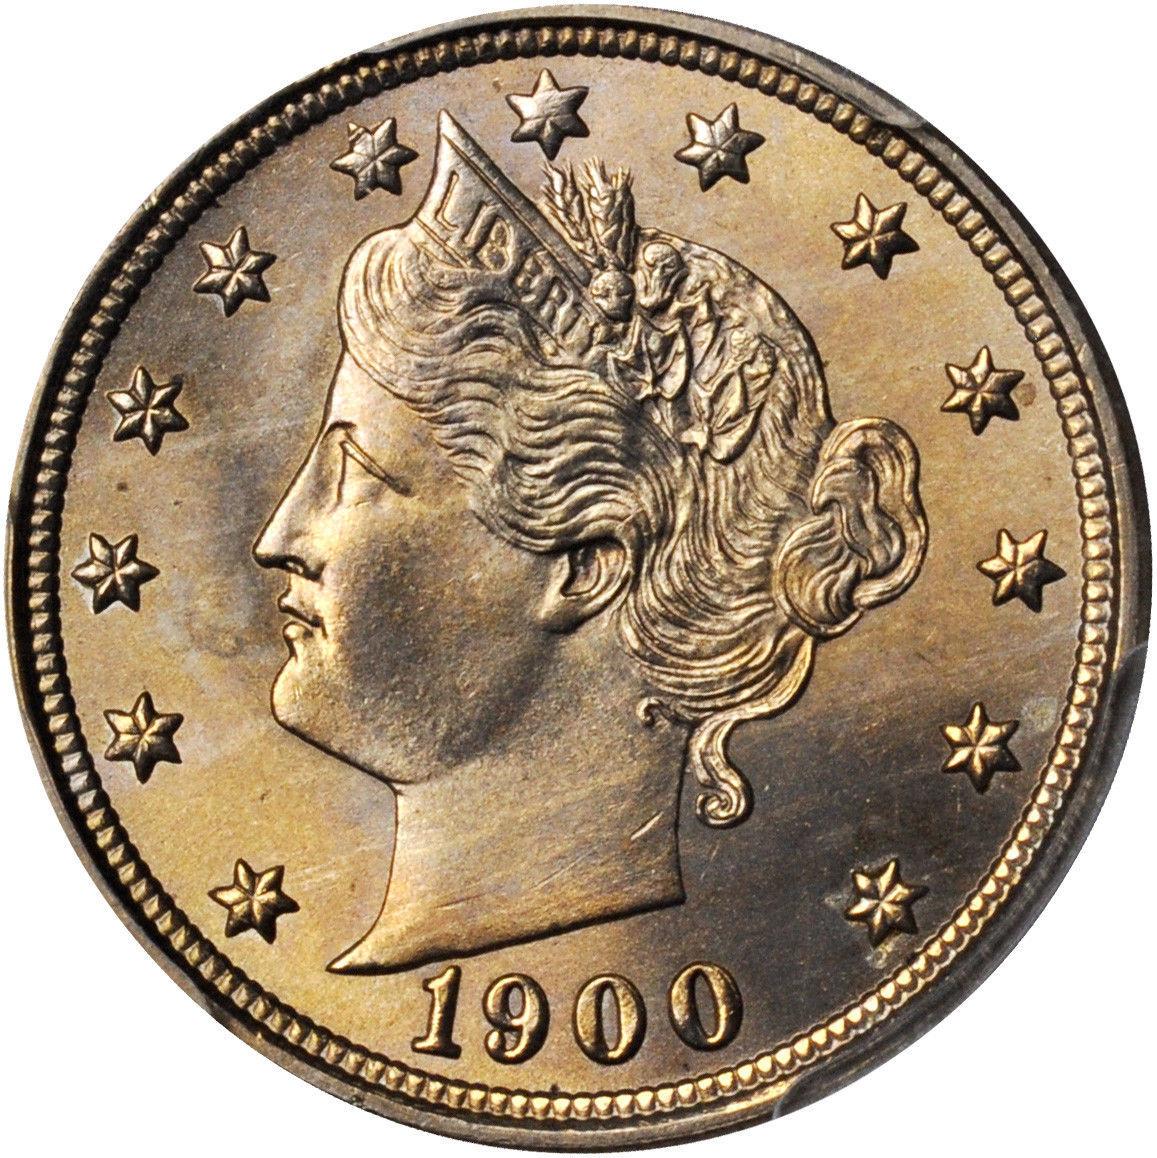 1900 Liberty Head Nickel - PCGS MS-66  - Mint State 66 - V Nickel image 6